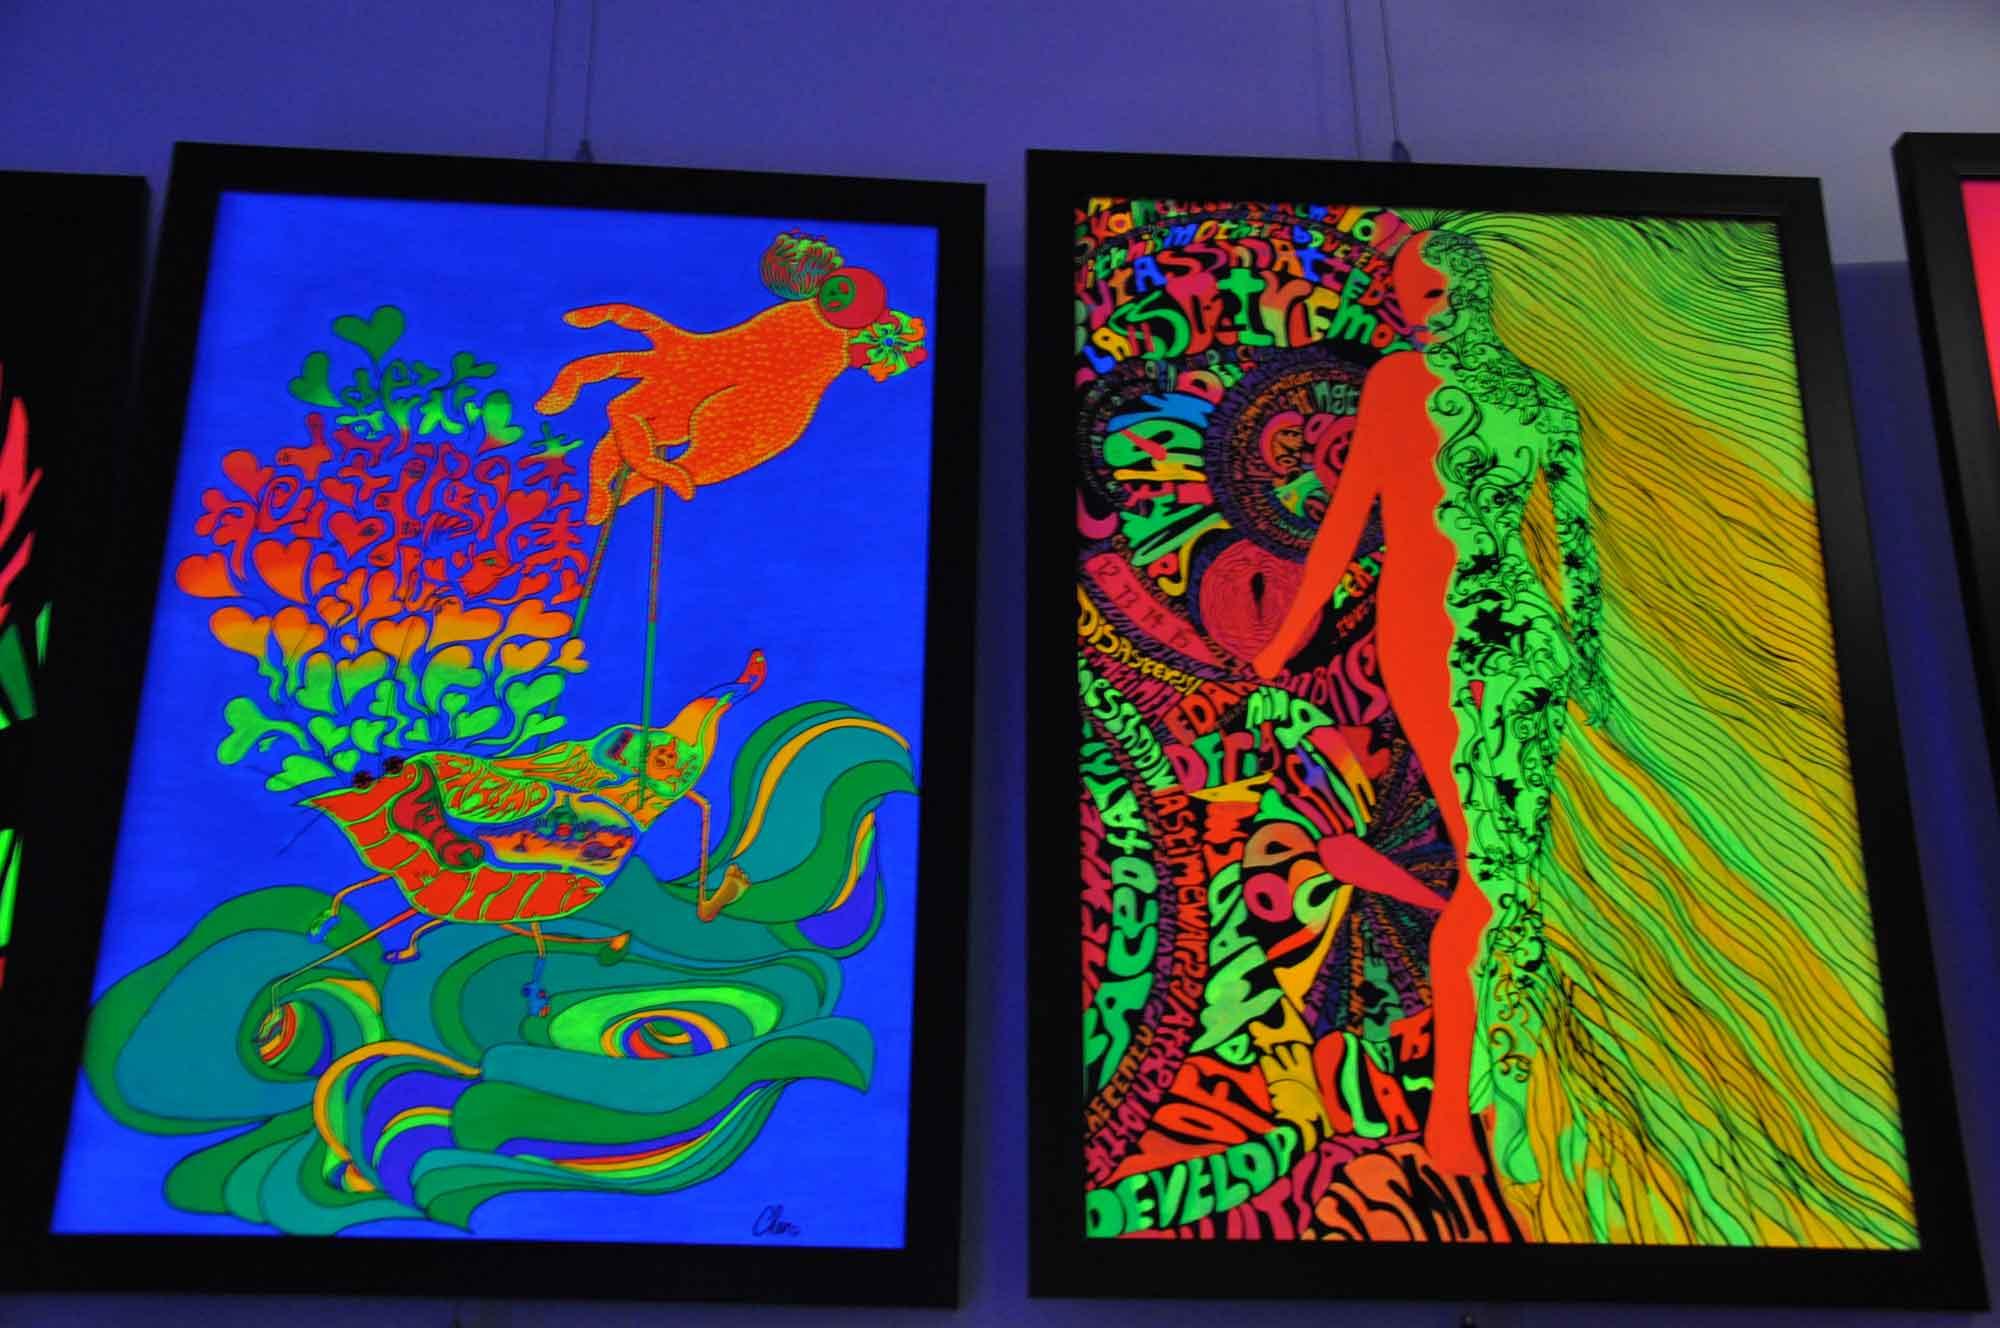 10 Fantasia Macau psychedelic art